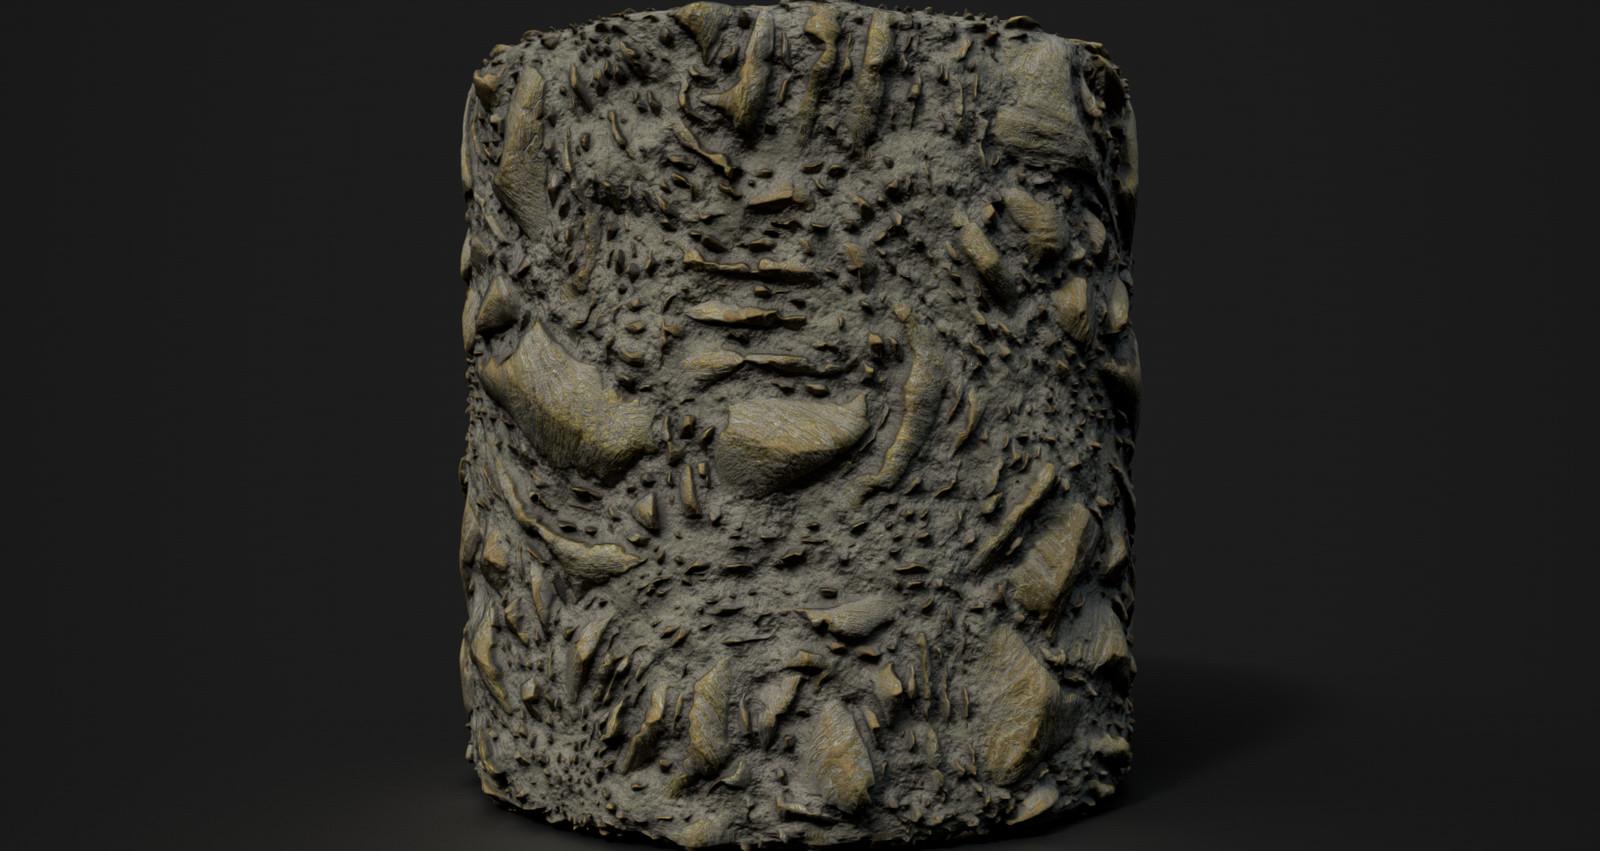 Venus rock/terrain doodle.